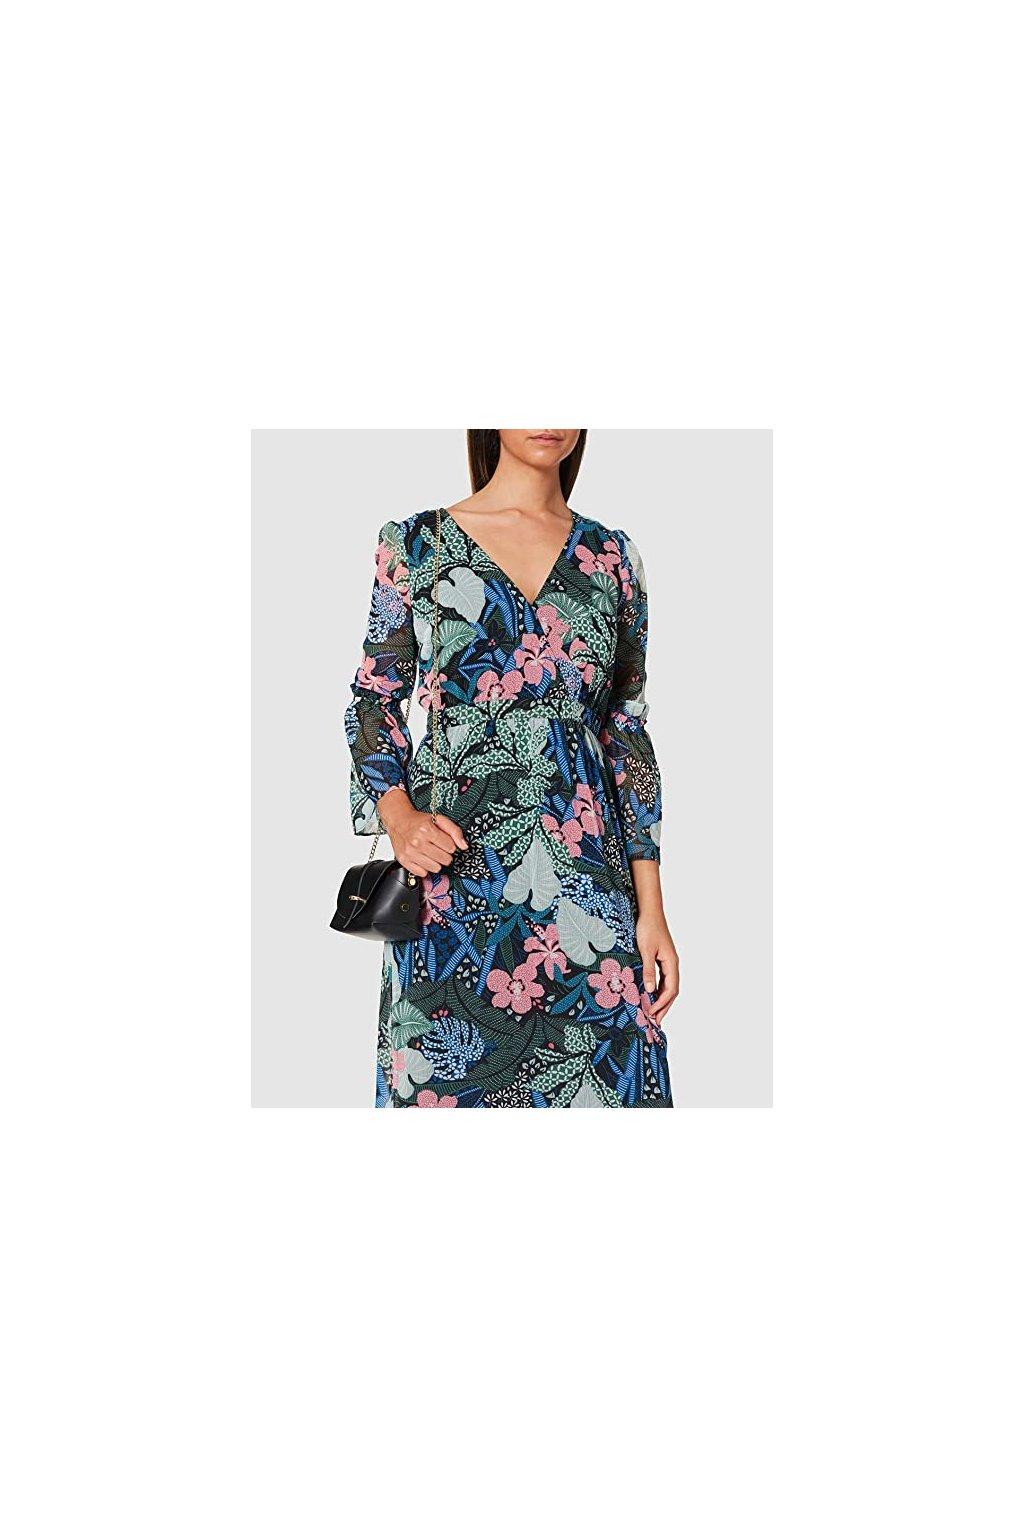 Dámské šaty Tommy Hilfiger DW0DW03616 901